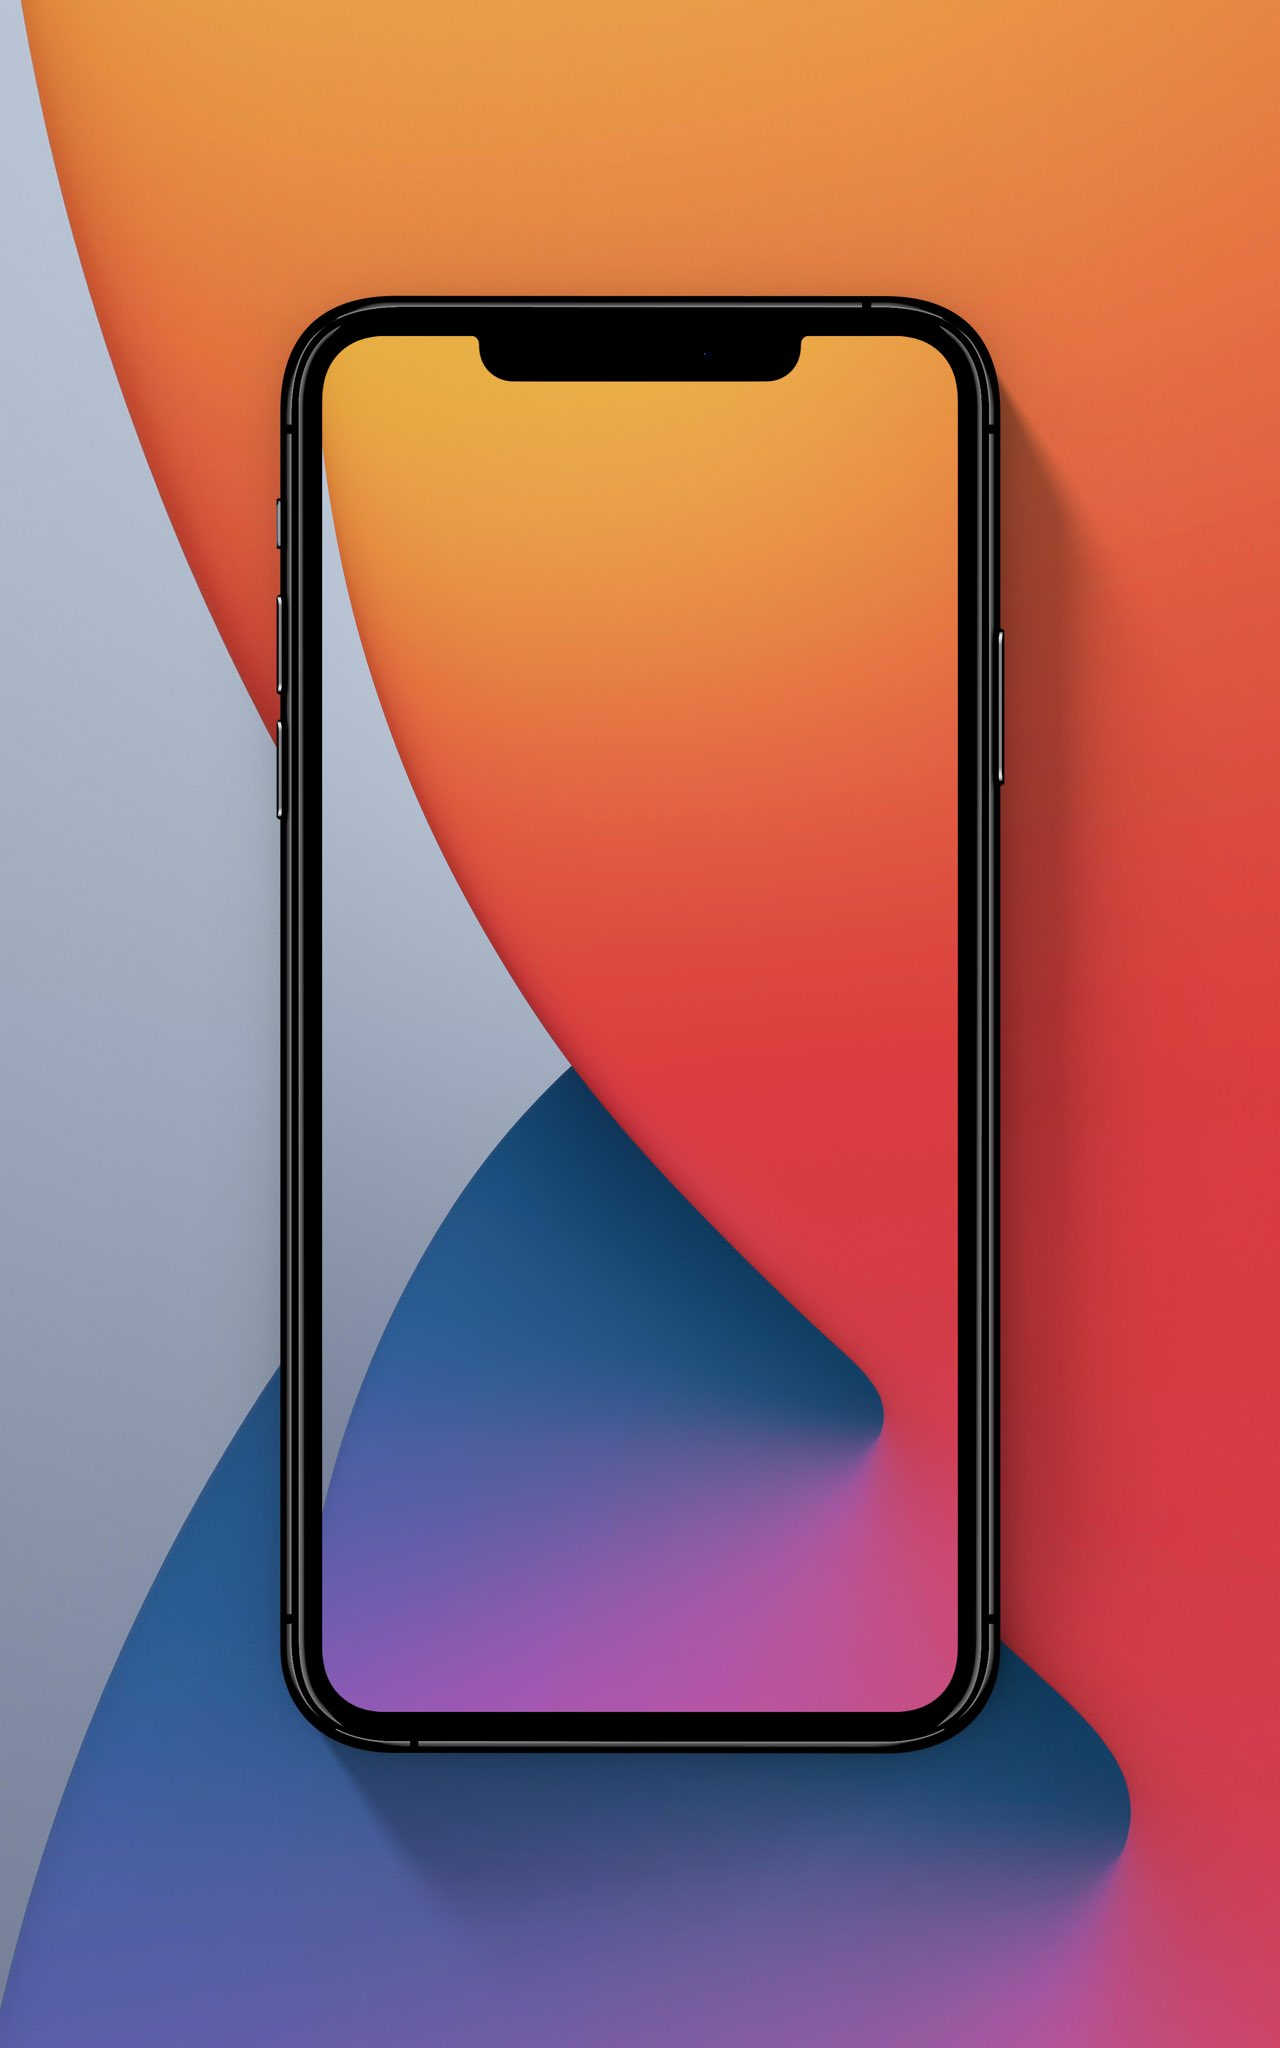 Download Ios 14 Ipados 14 Beta Wallpapers For Iphone Or Ipad Redmond Pie